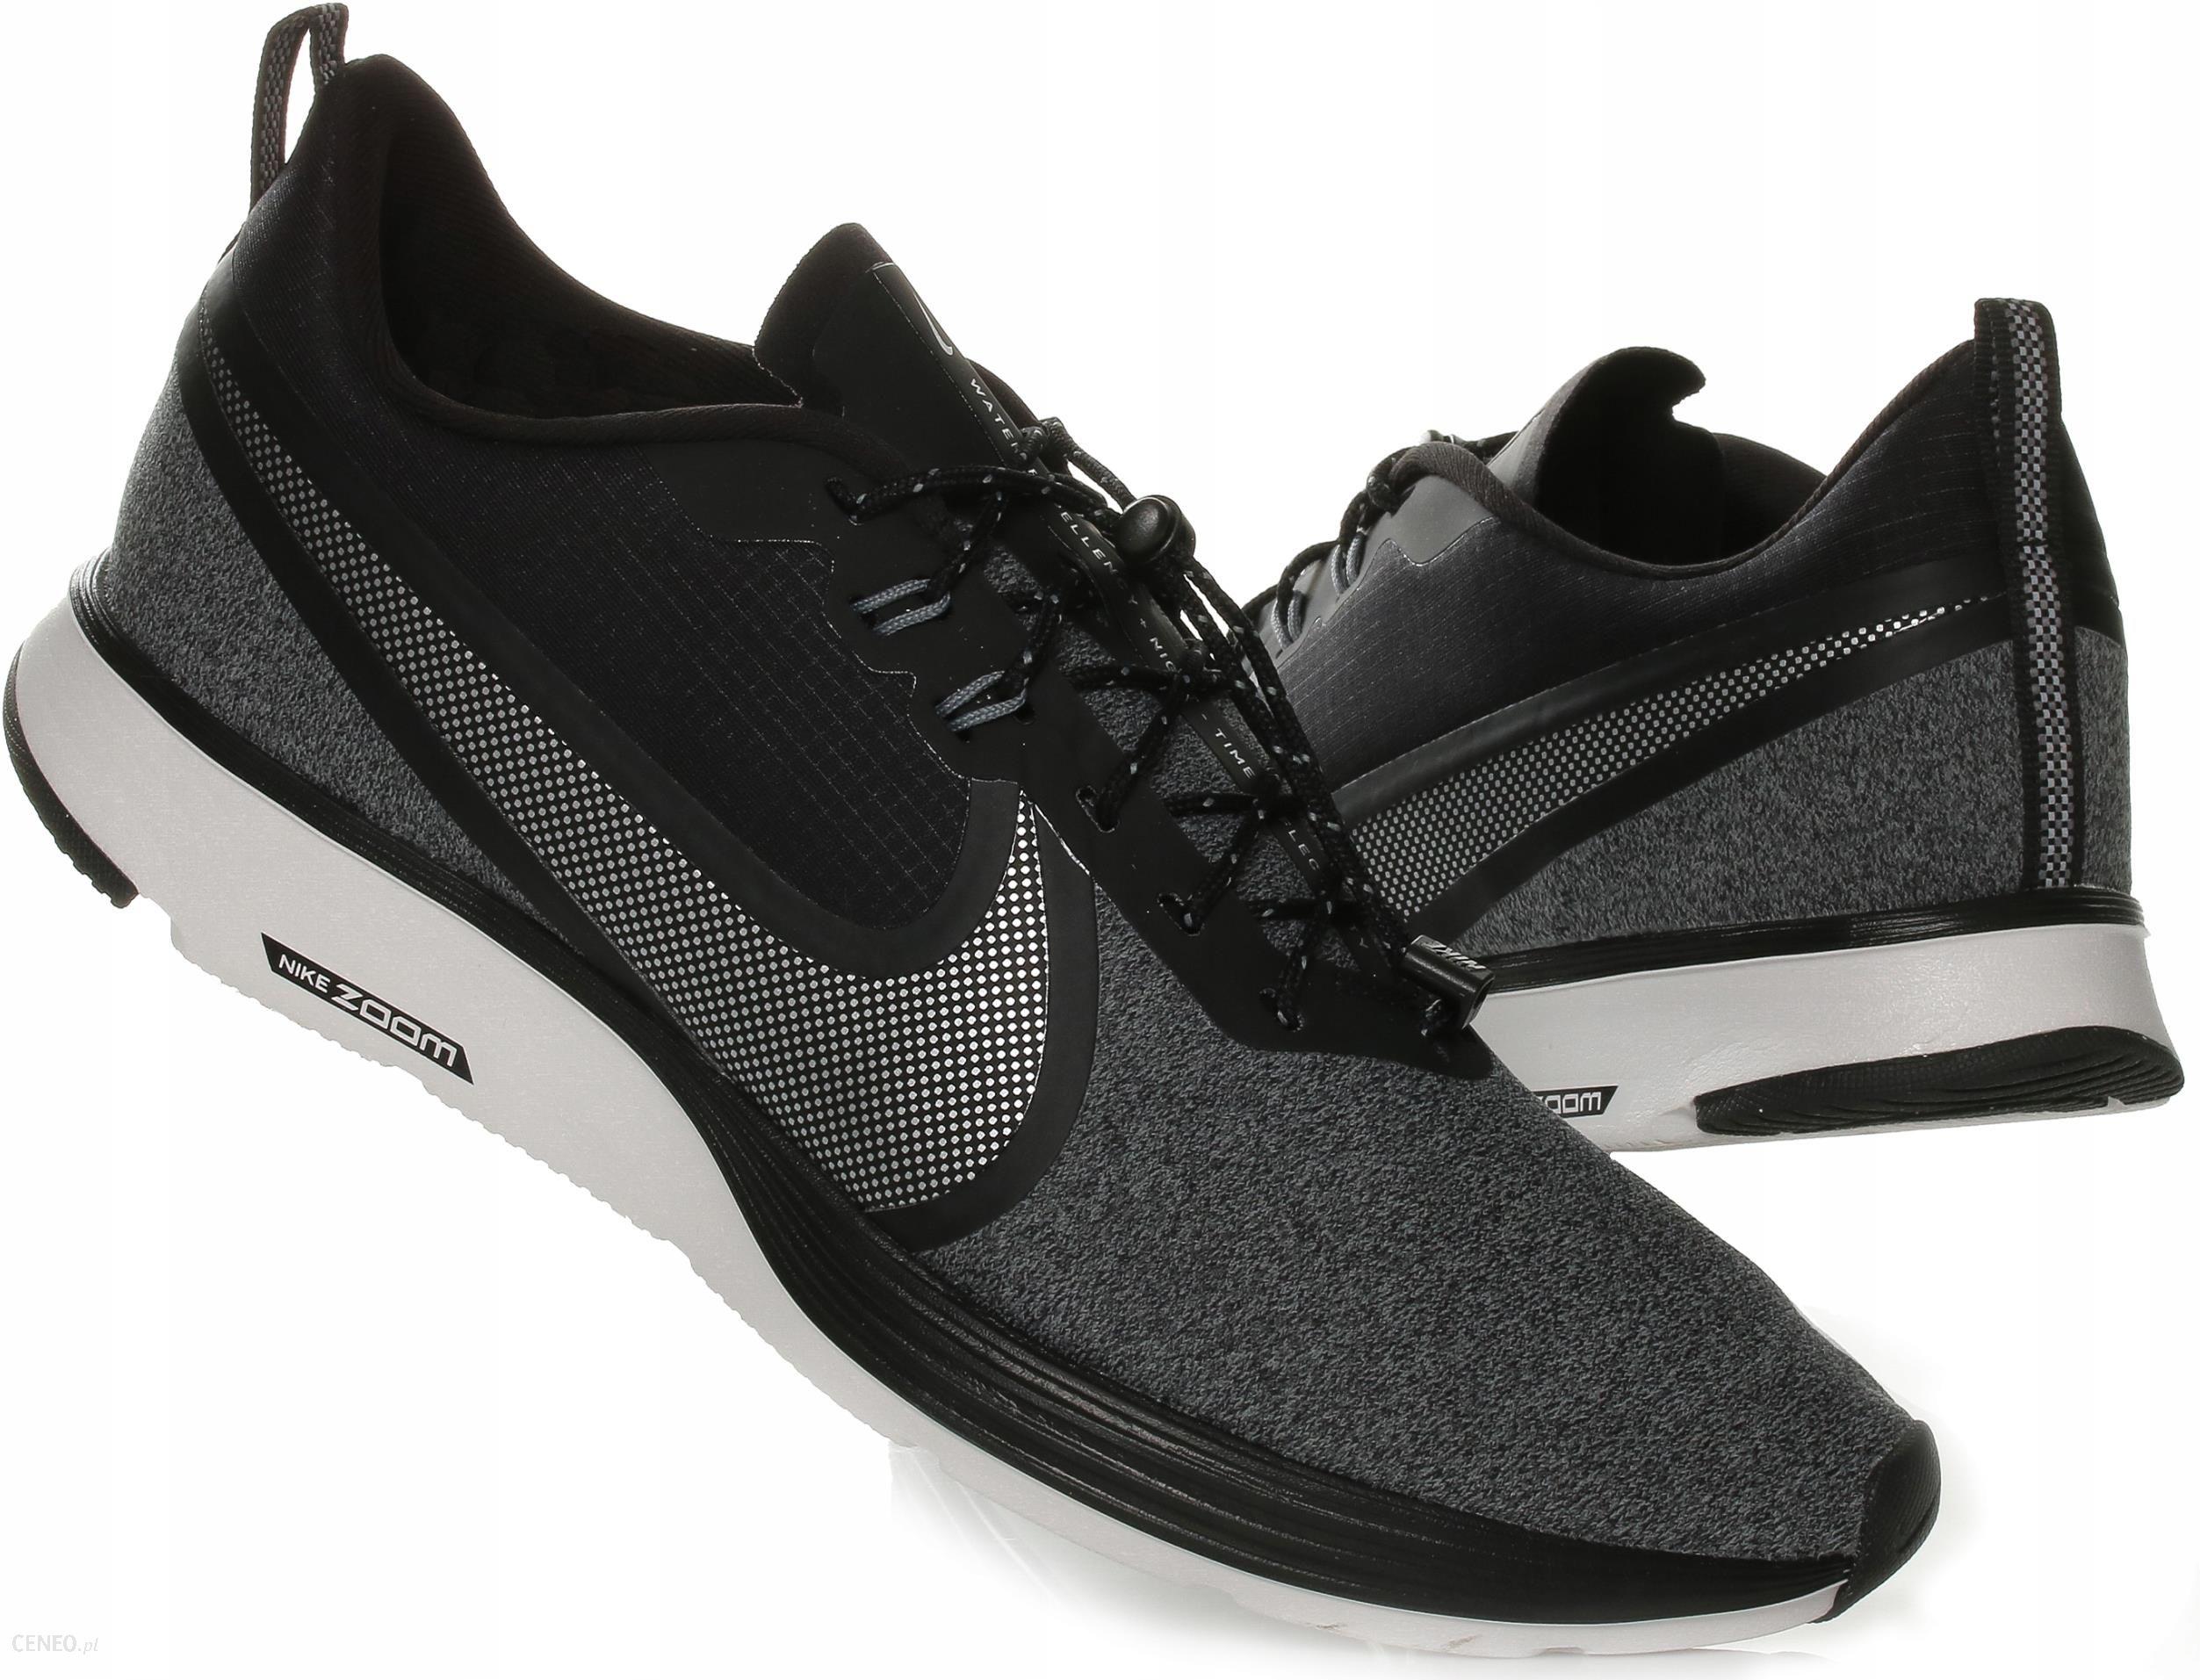 5b4236a7cd3 Buty męskie Nike Zoom Strike 2 Shield AR9799-002 - Ceny i opinie ...